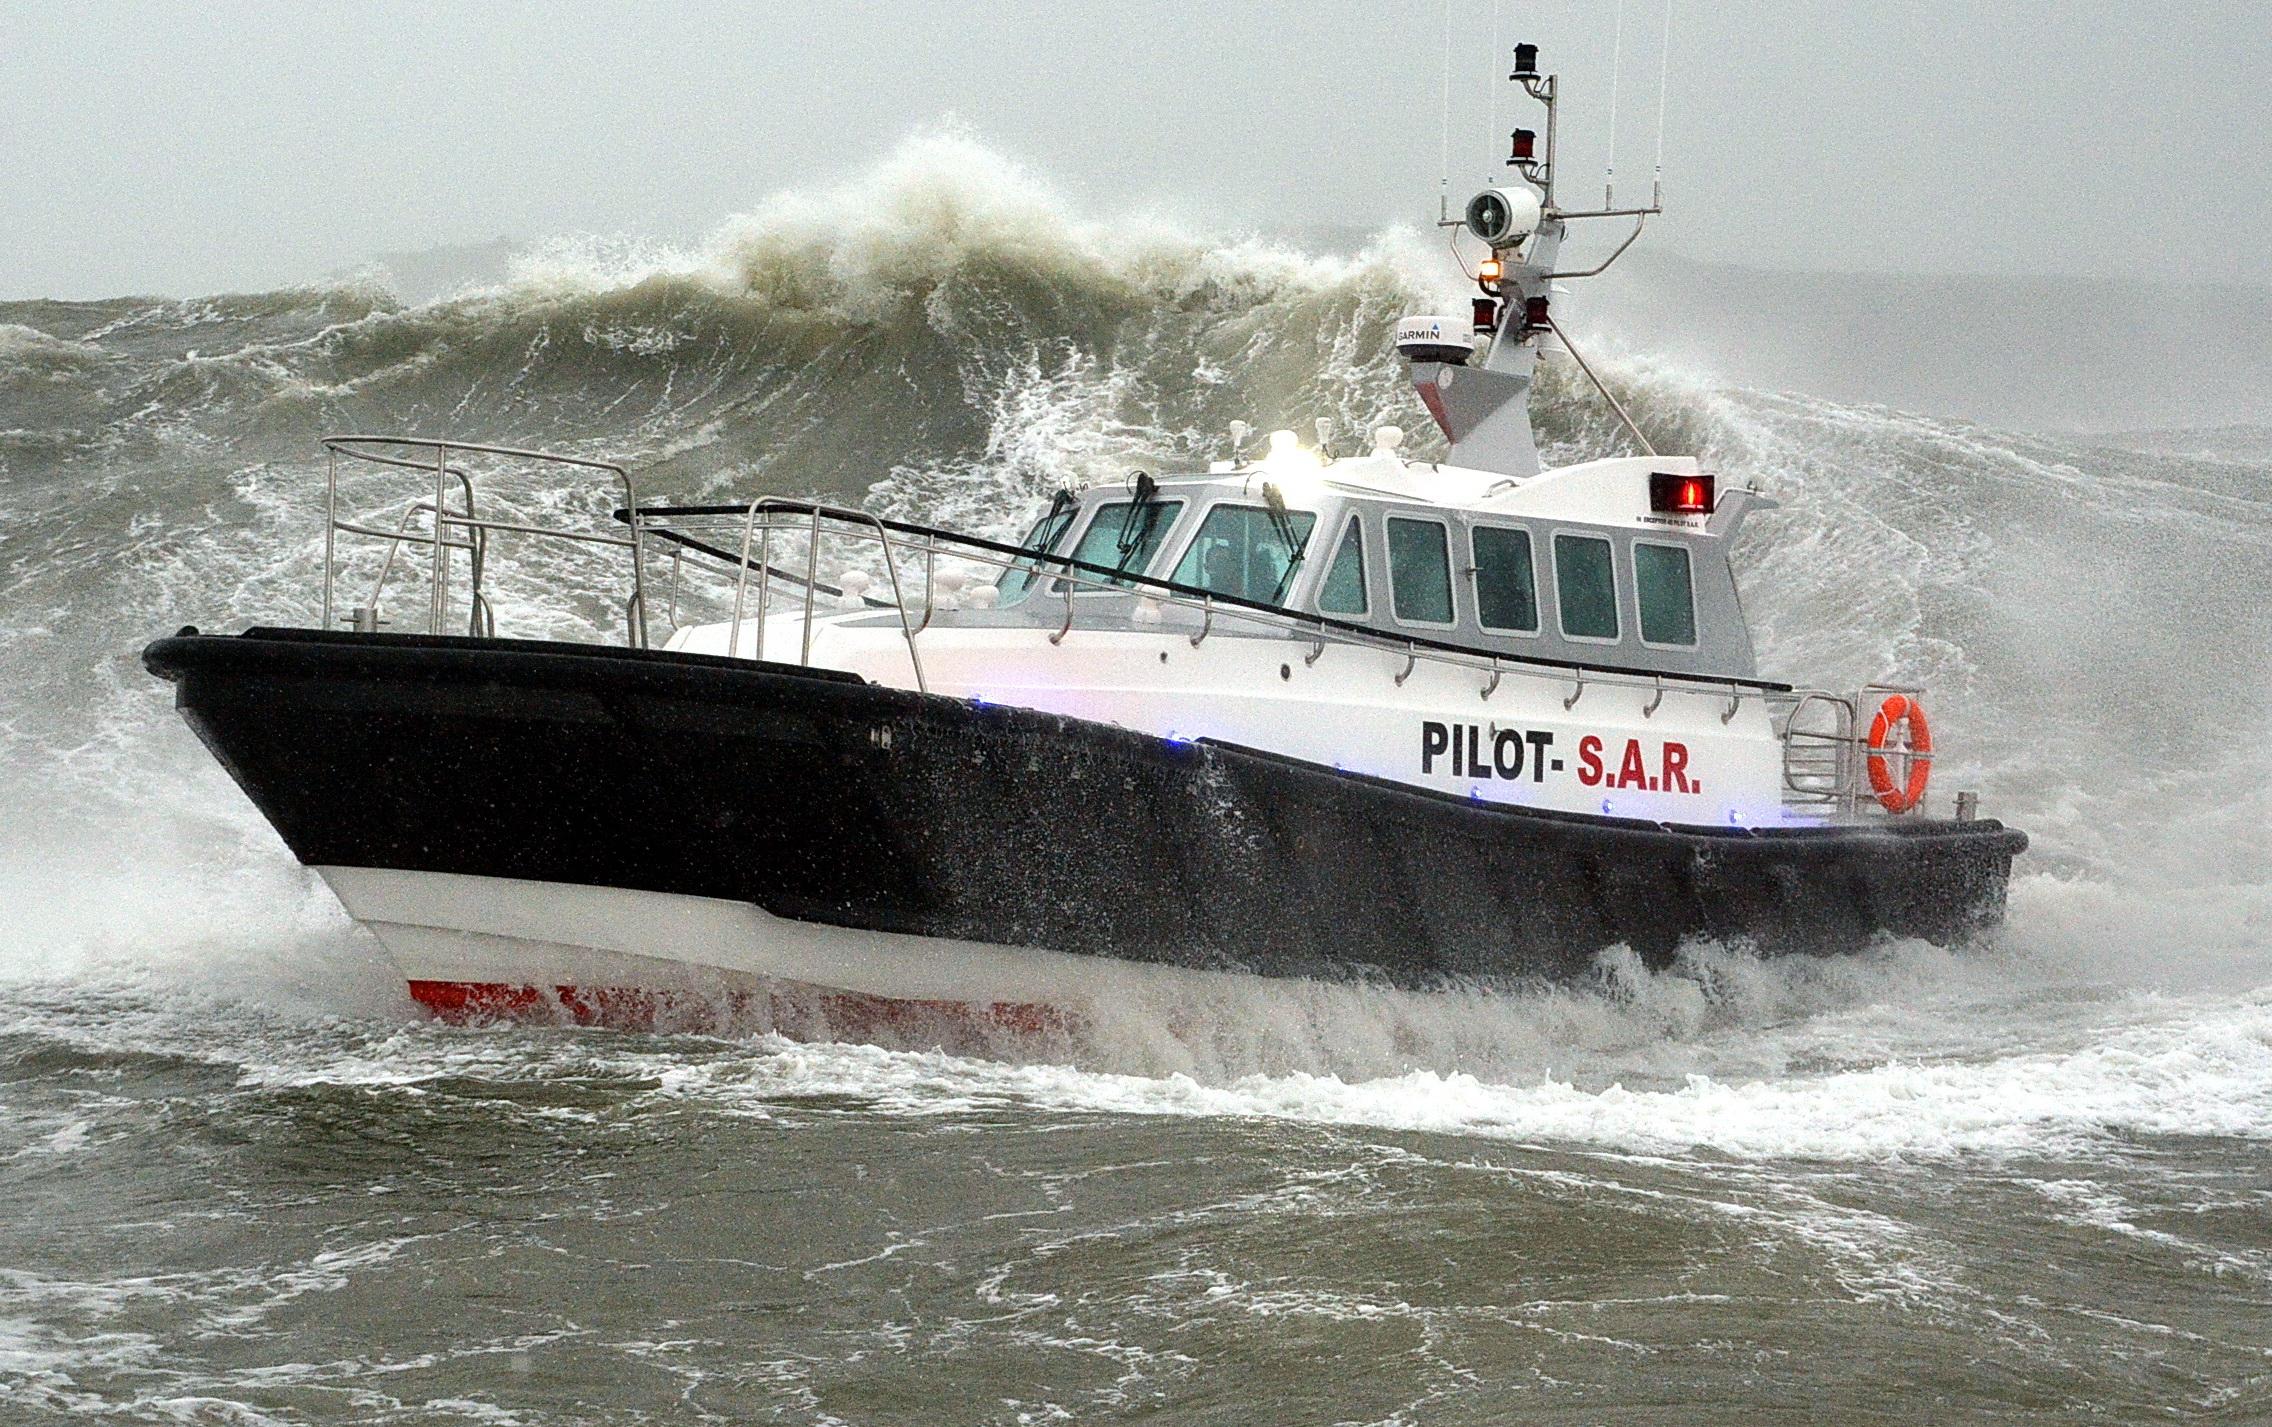 Pilot boat F11 4